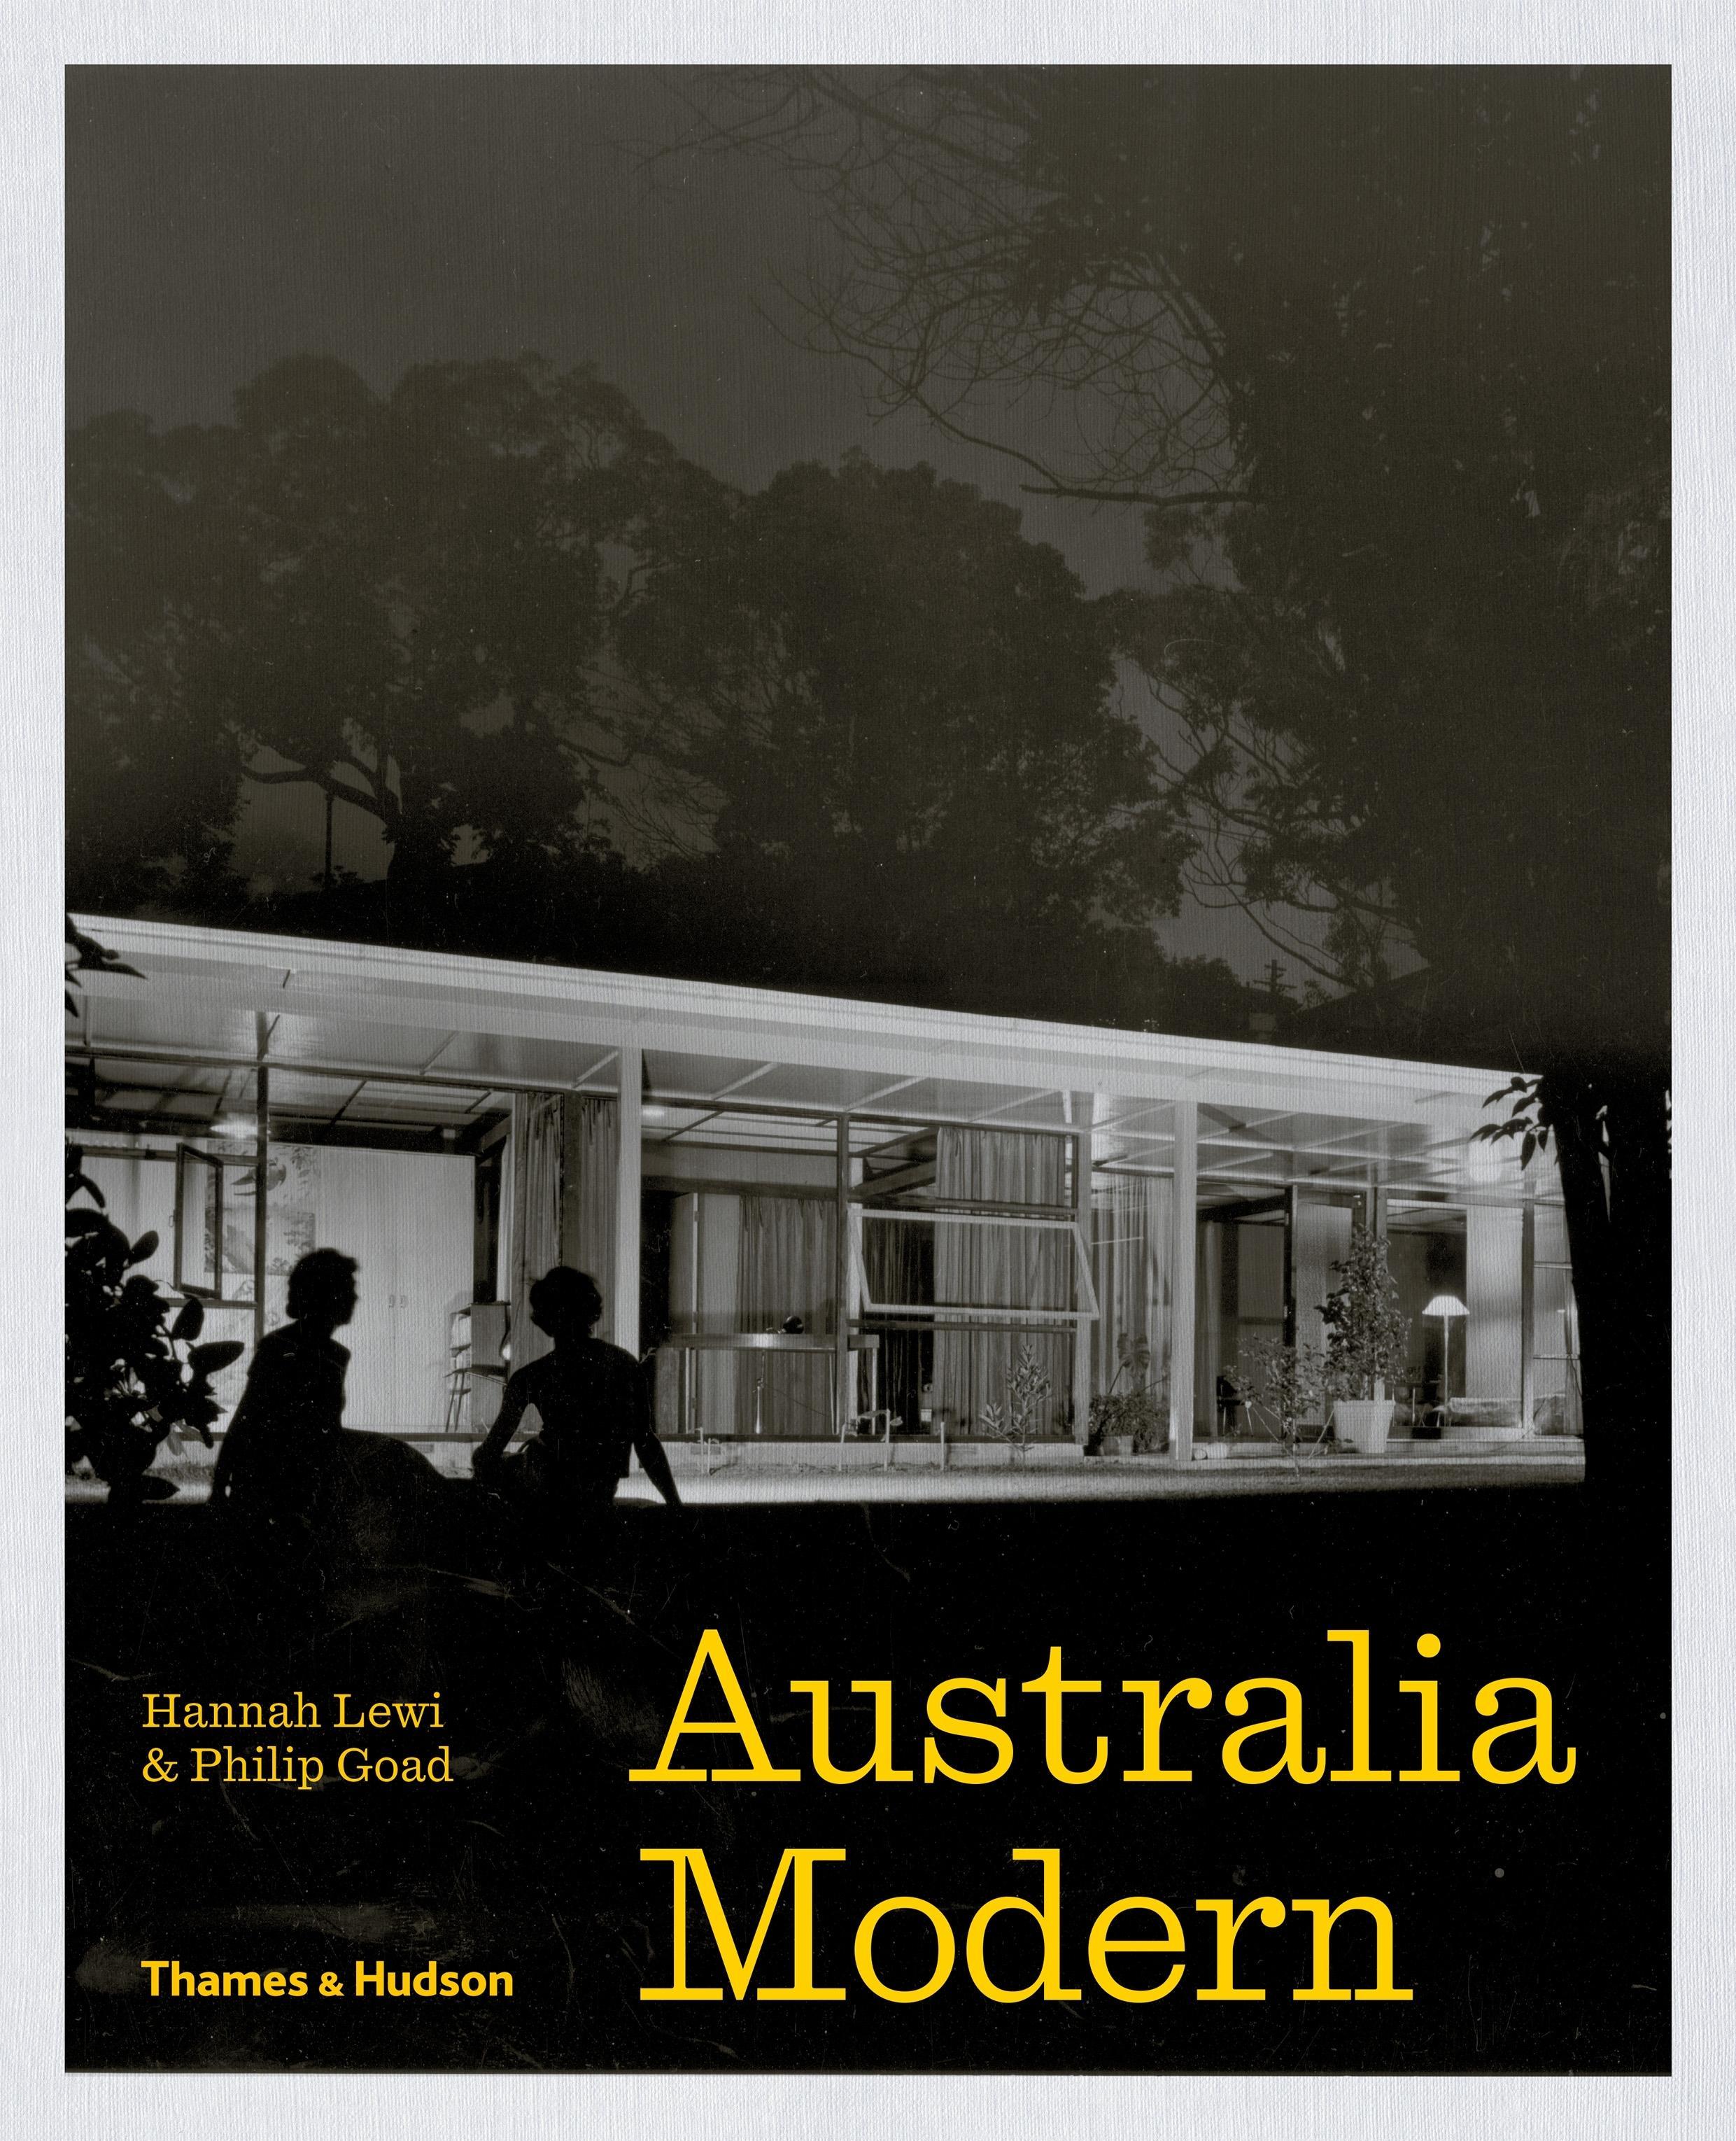 AustraliaModern